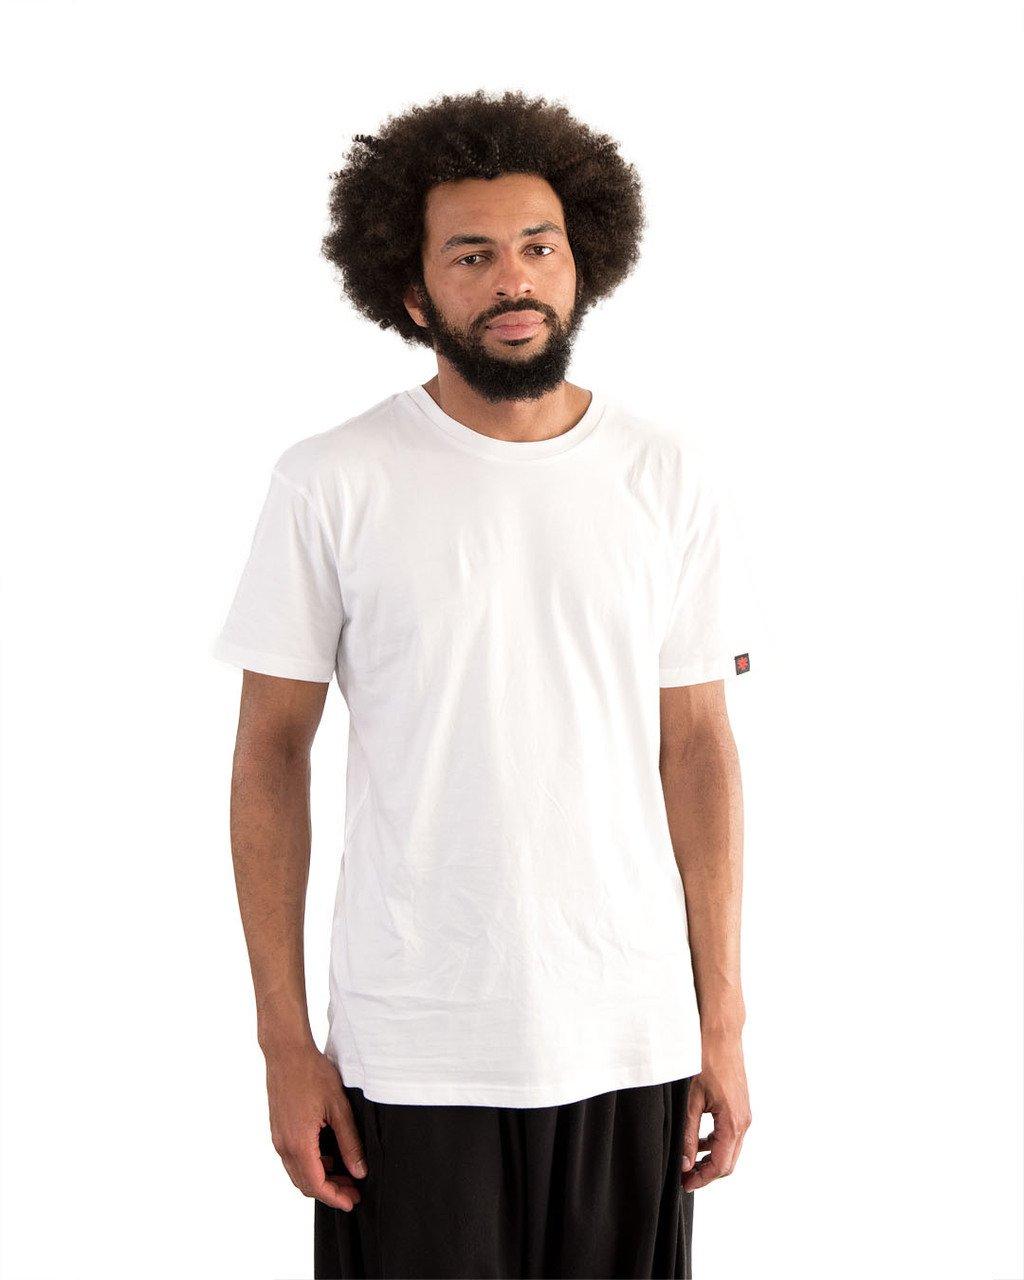 17bbdb4b6 Etiko - Fairtrade Organic Cotton T-shirt